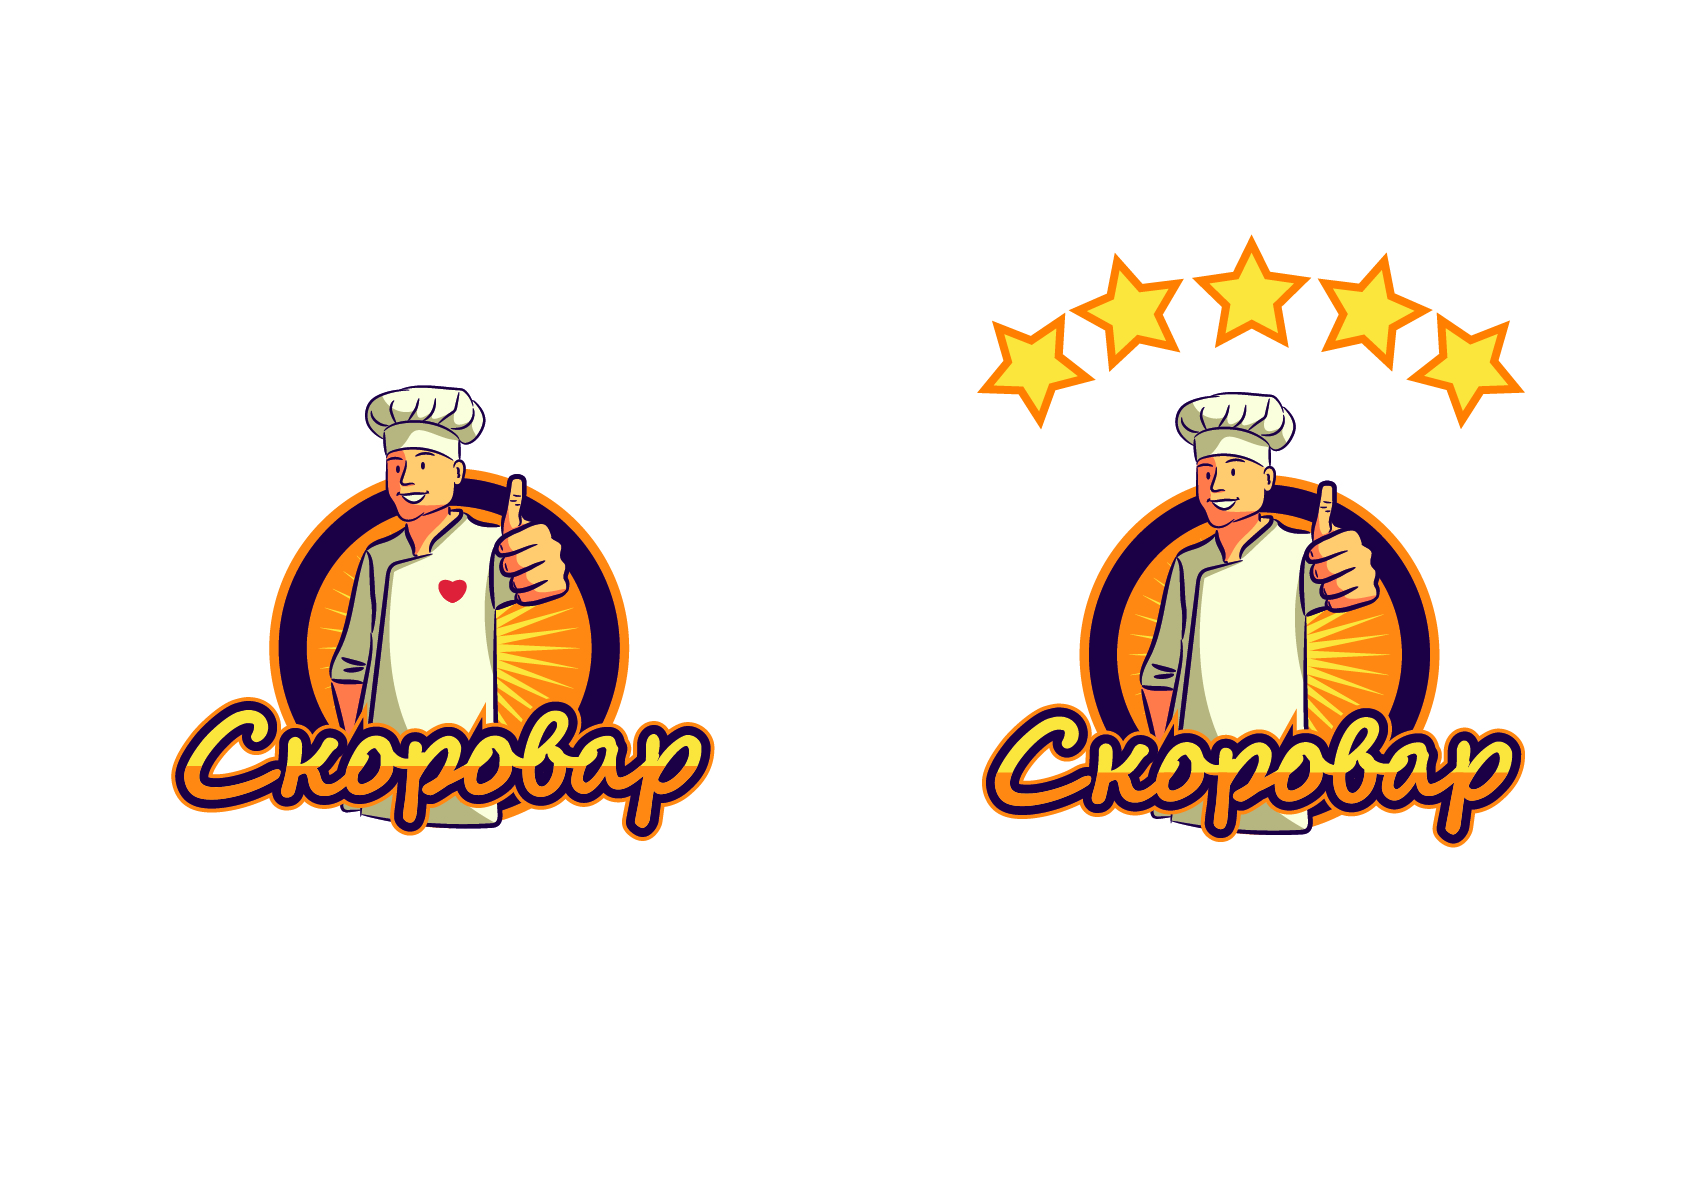 Иллюстрация/логотип фото f_5855dc6d089eeb05.jpg